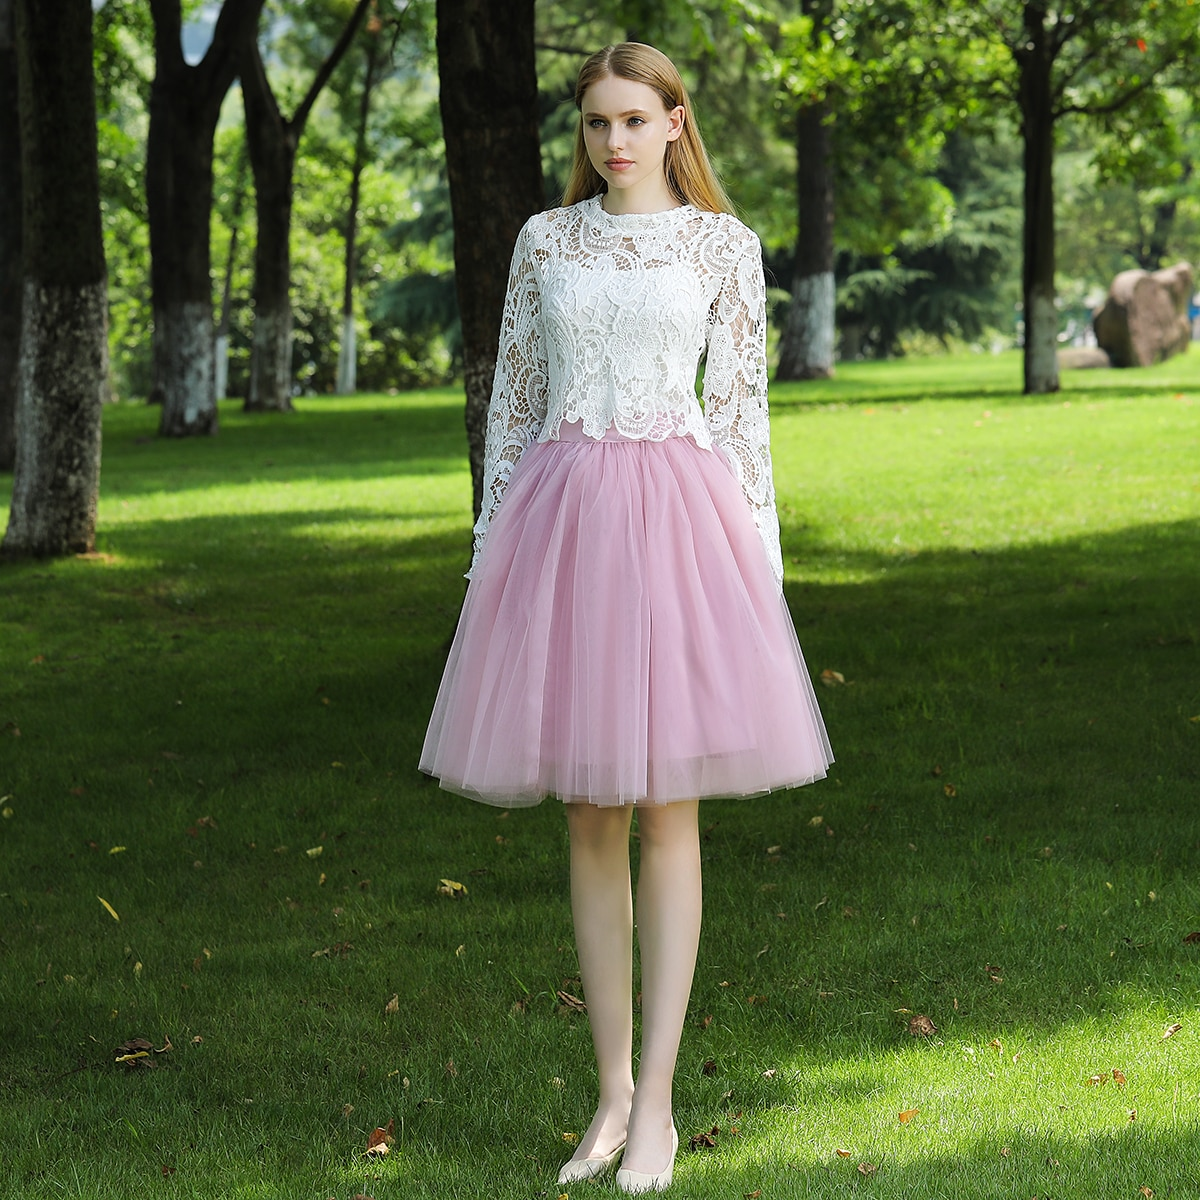 7 Layers Midi A Line Tutu Tulle Skirt High Waist Pleated Skater Skirts Womens Vintage Lolita Ball Gown Summer 19 saias jupe 2